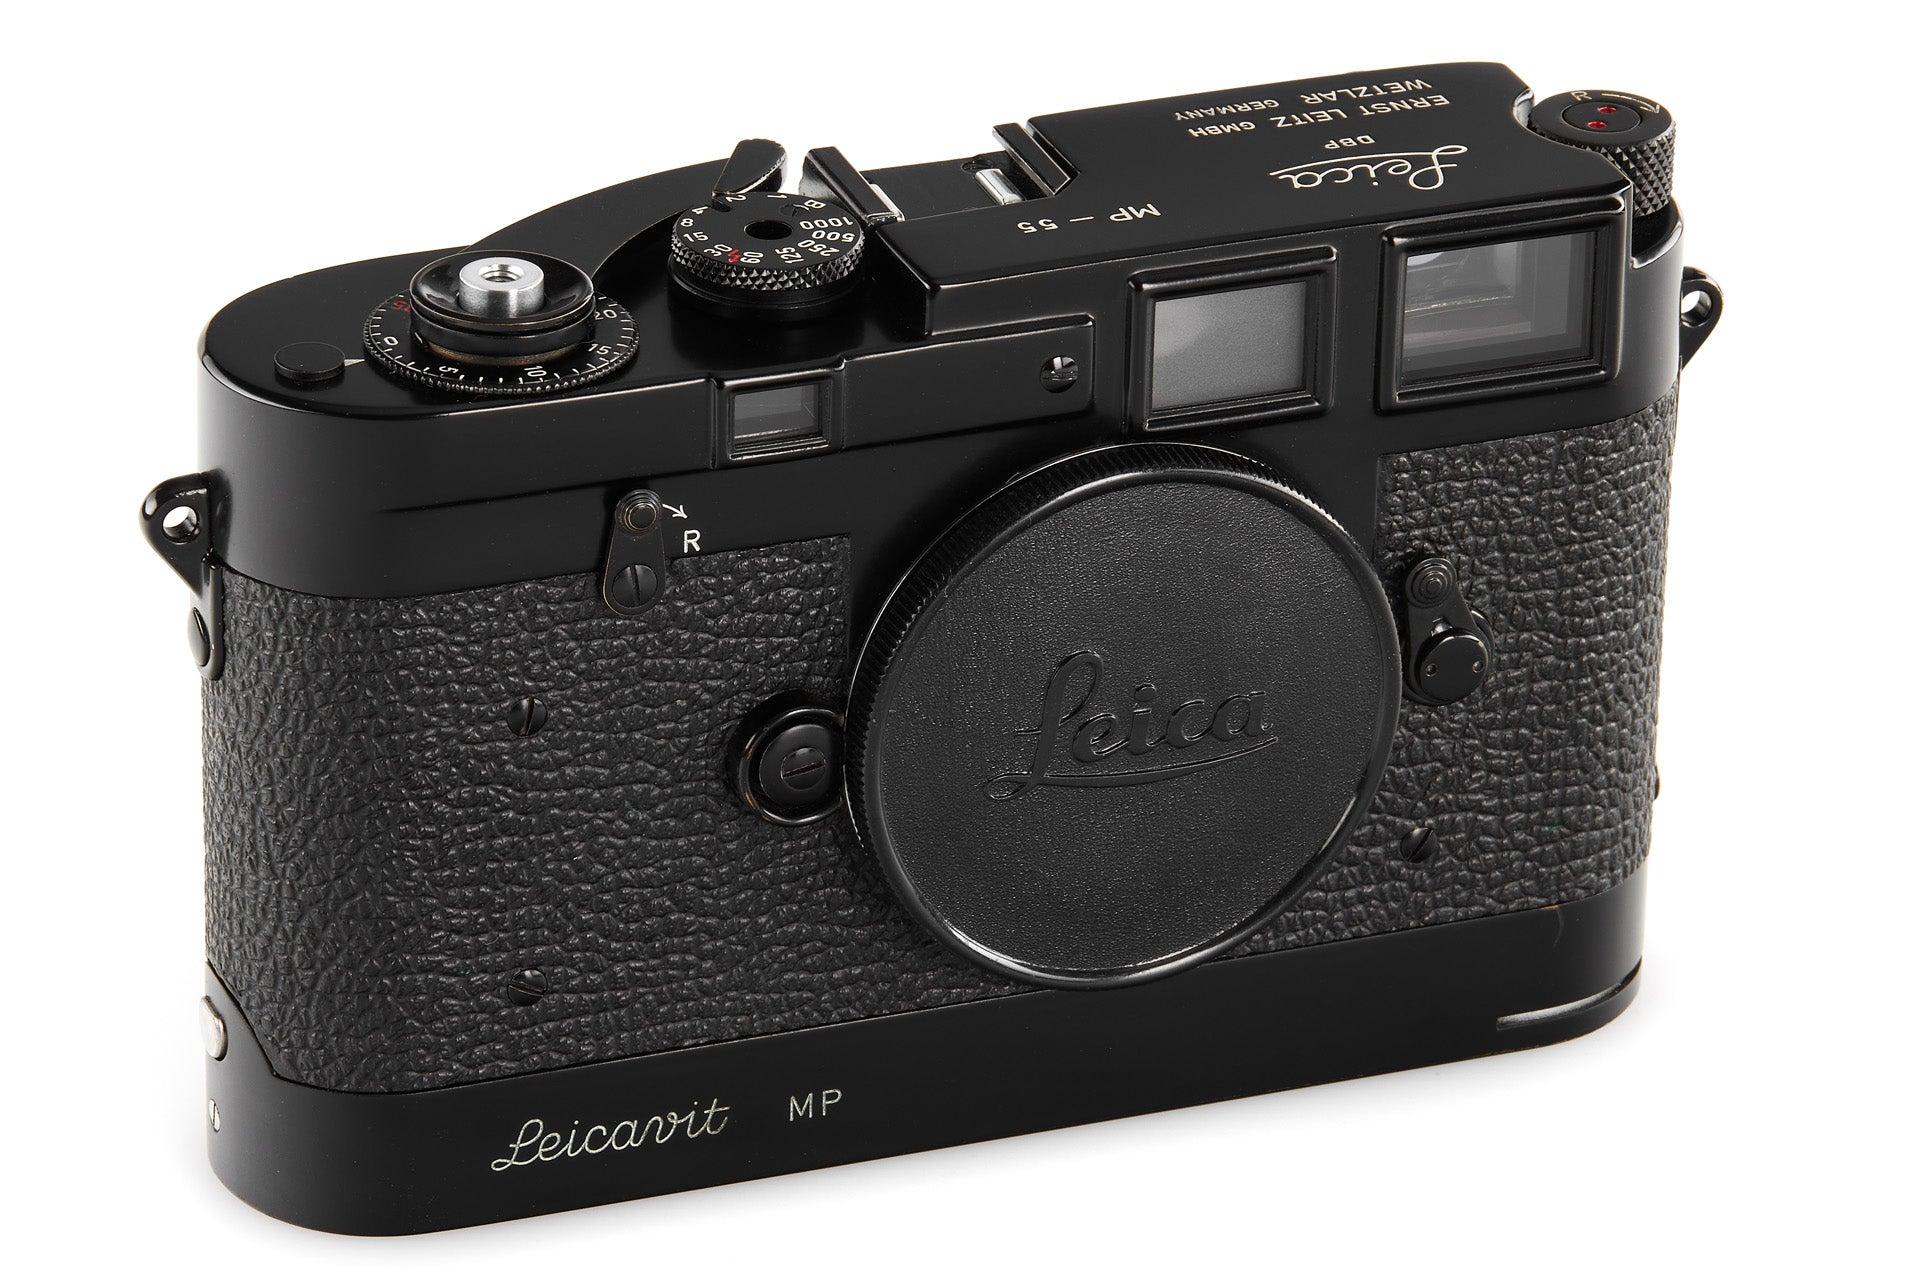 The Leica MP black paint no.55